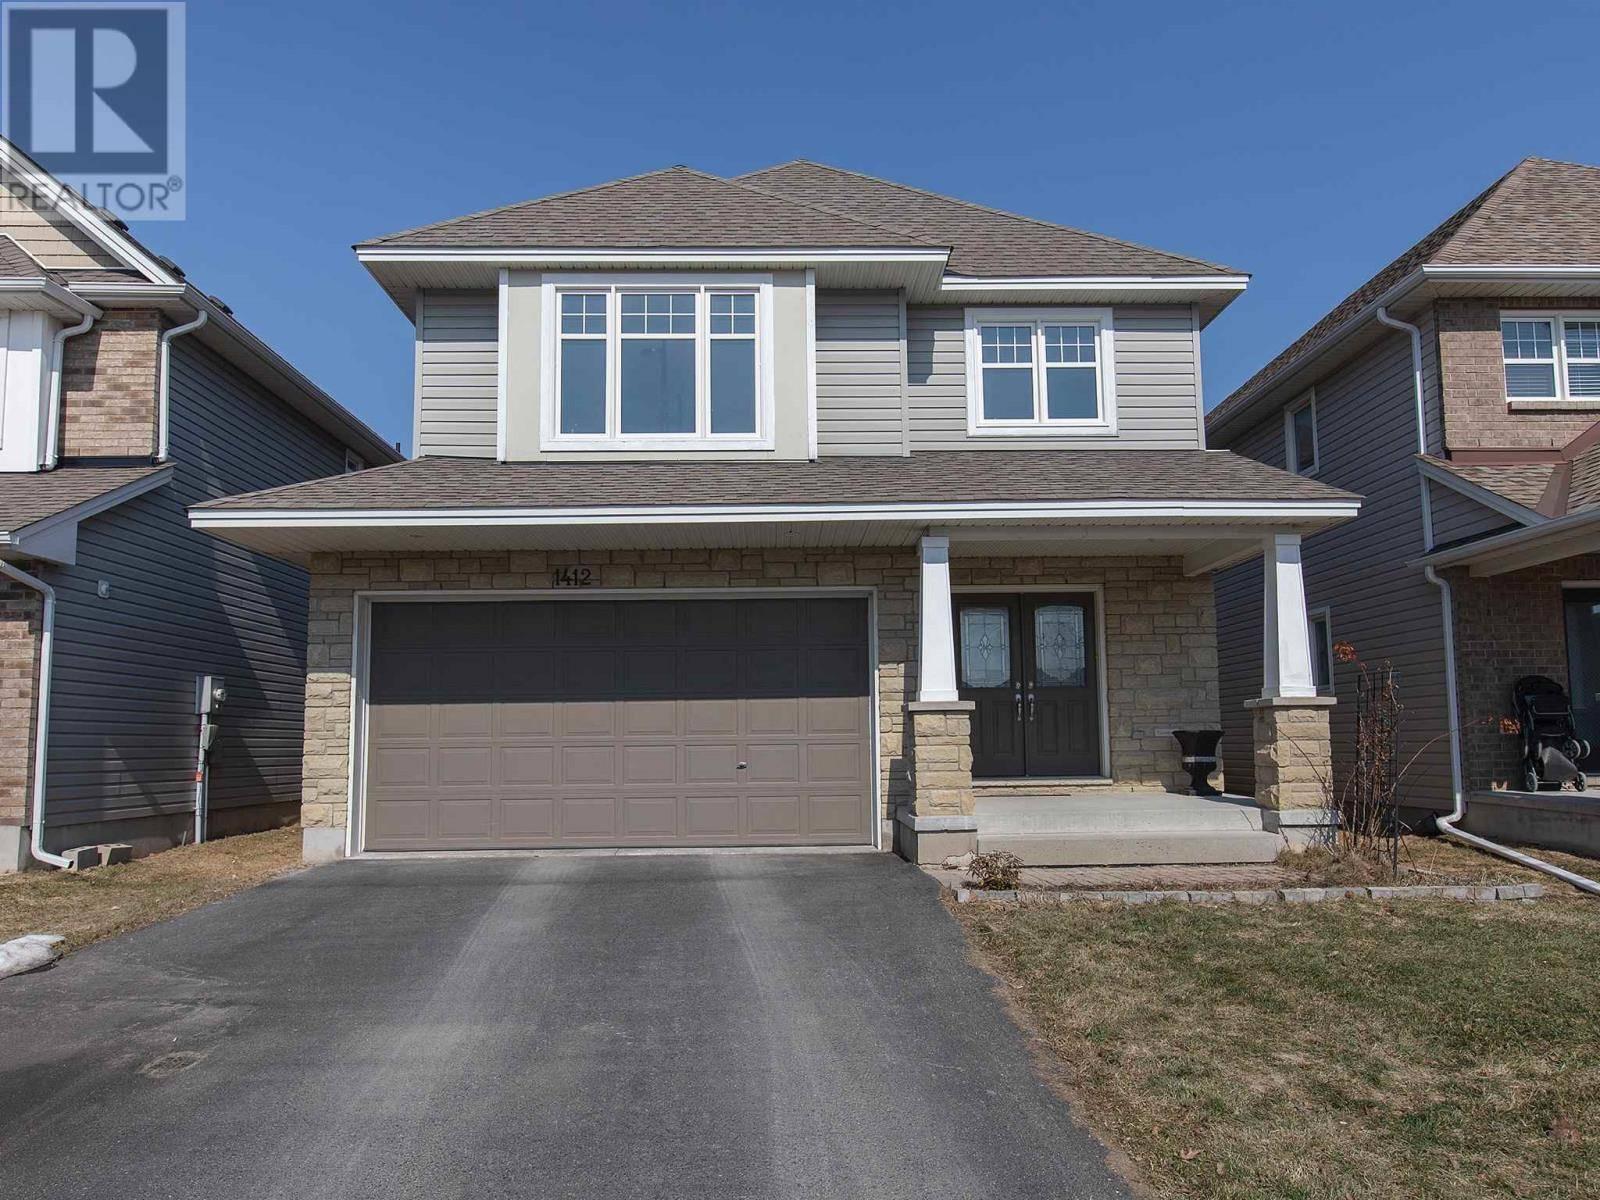 House for sale at 1412 Evergreen Dr Kingston Ontario - MLS: K20001278